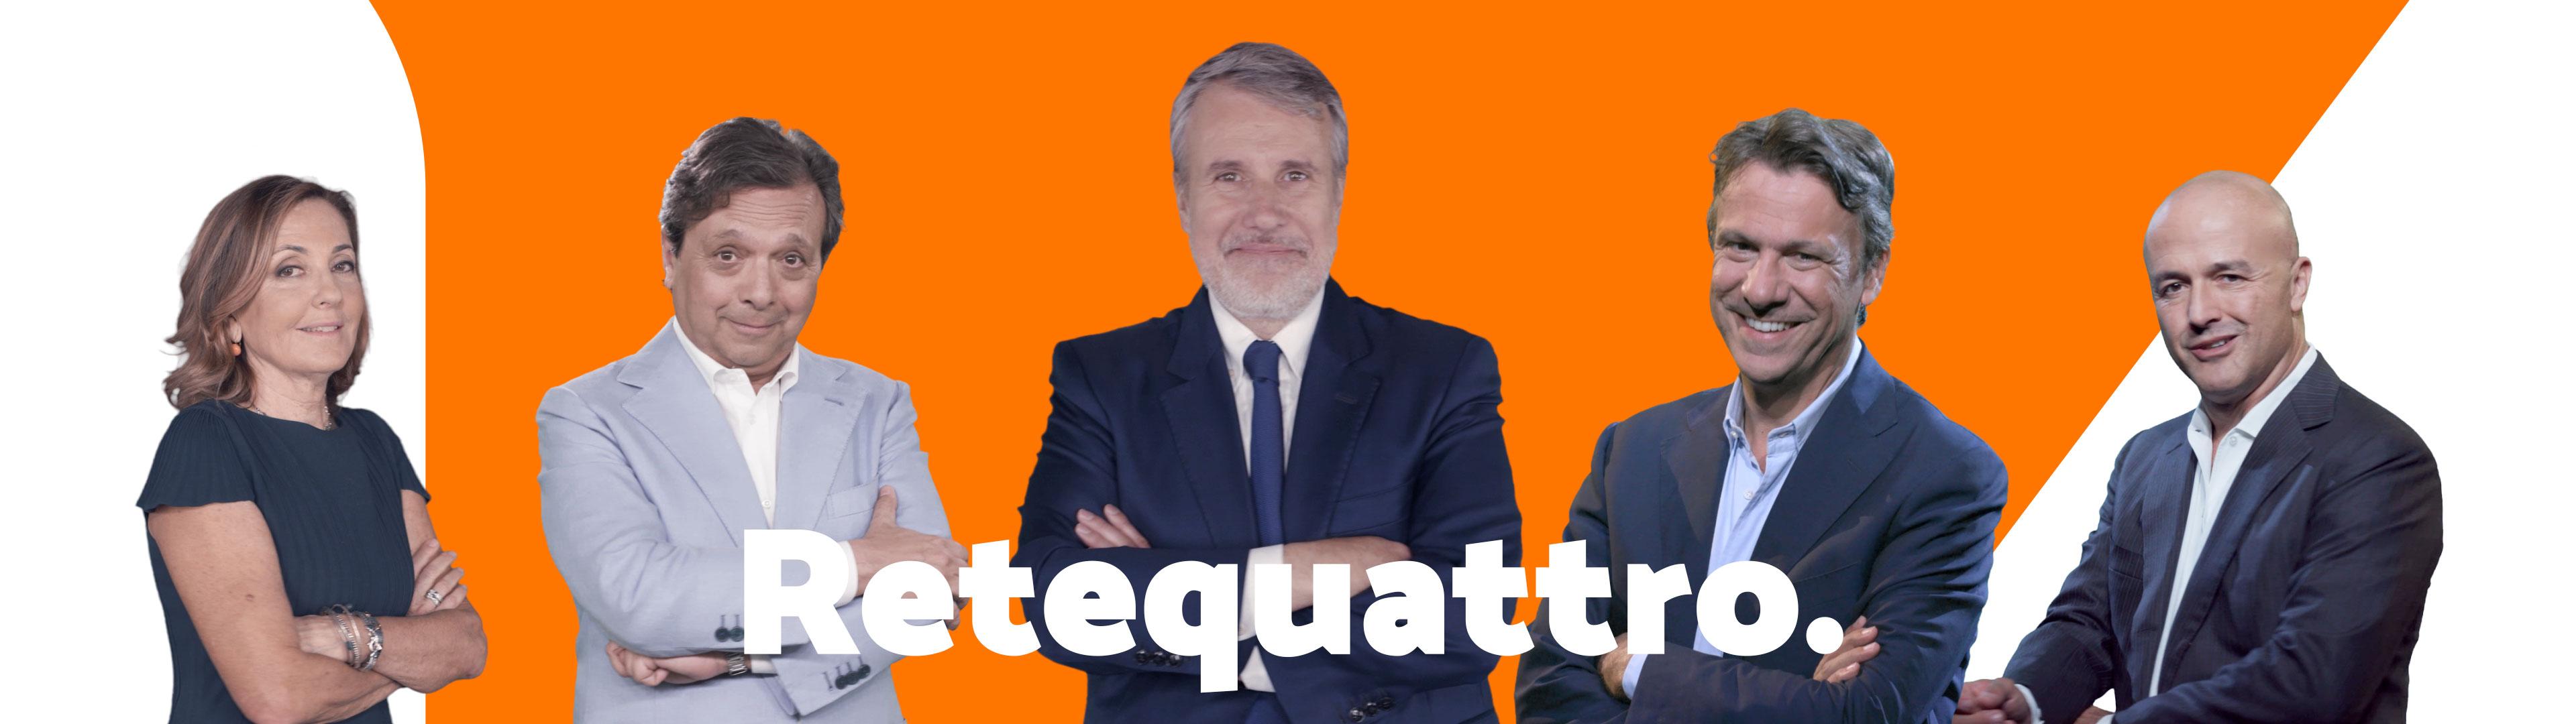 Mediaset Rete Quattro - channel branding